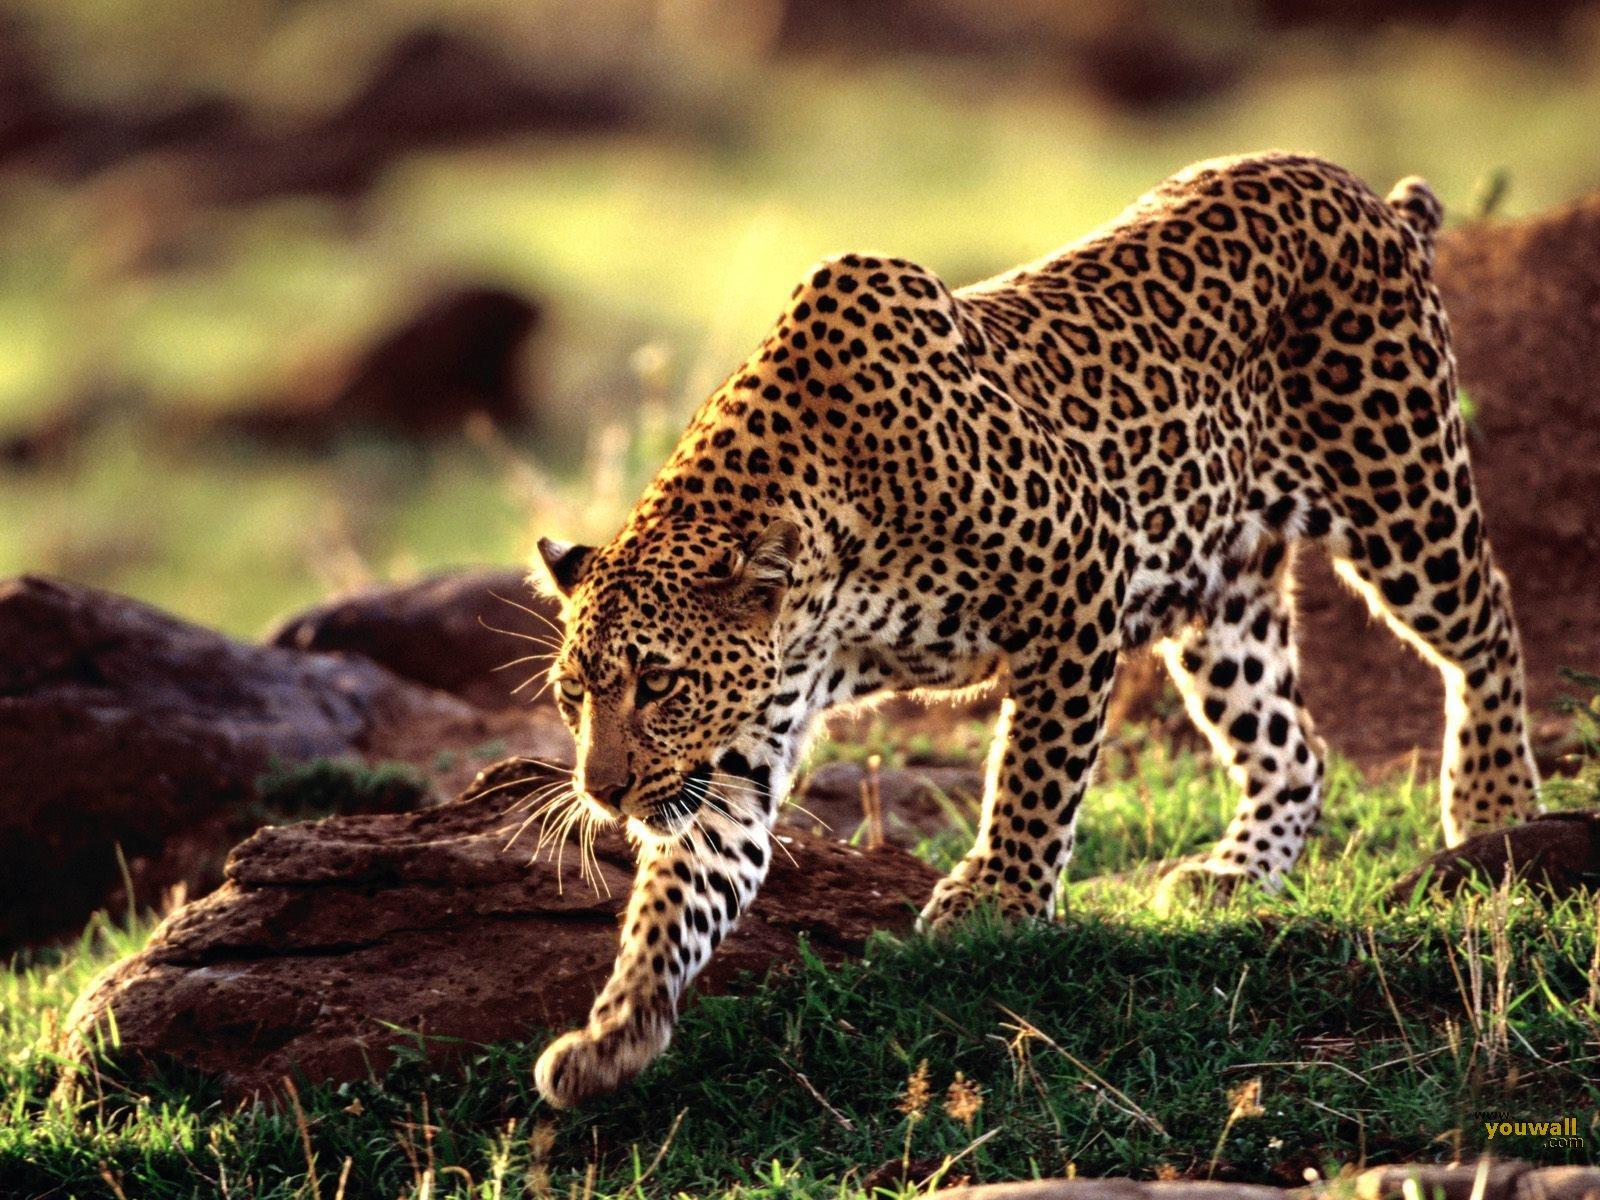 http://1.bp.blogspot.com/-MoJ5ikvBQz0/UHB5r4h6JrI/AAAAAAAAG1I/MKip3BB4CLY/s1600/cheetah-204.jpg